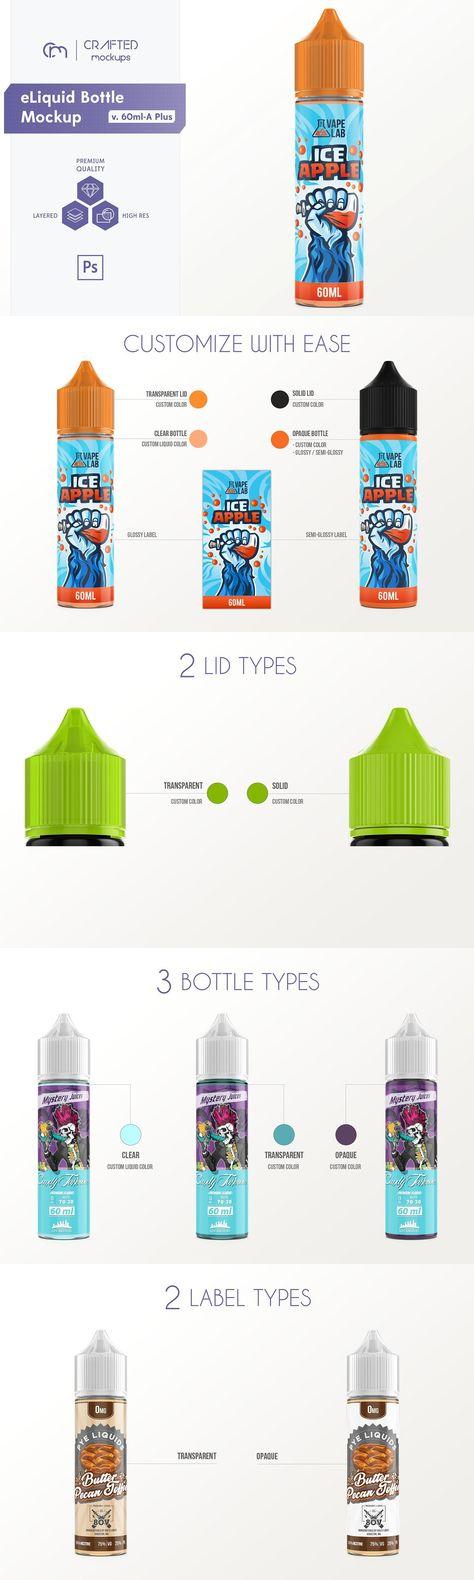 eLiquid Bottle Mockup v. 60ml-A Plus